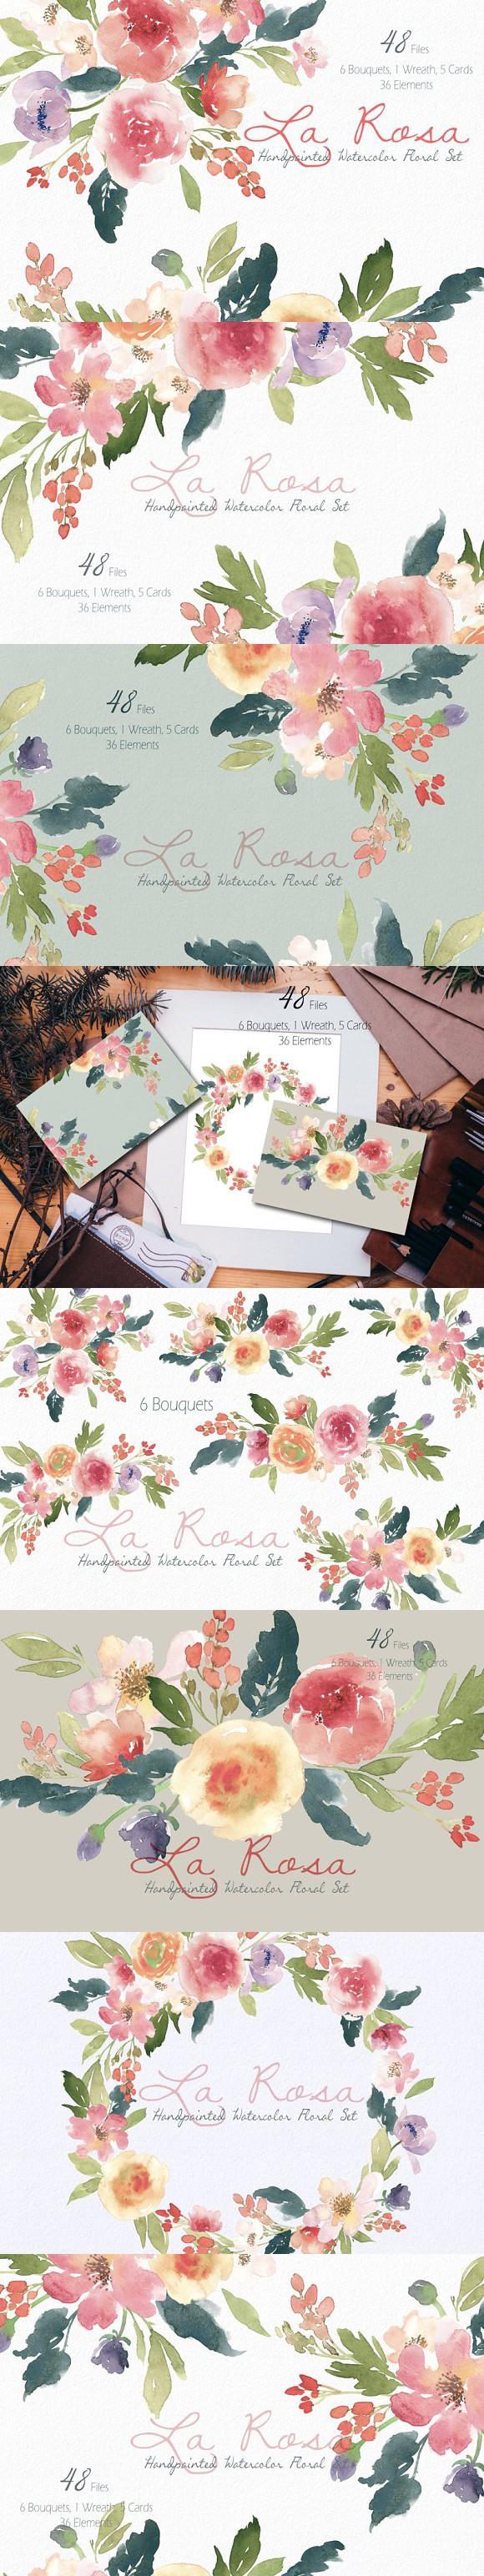 La Rosa- Watercolor Floral Set. Wedding Card Templates